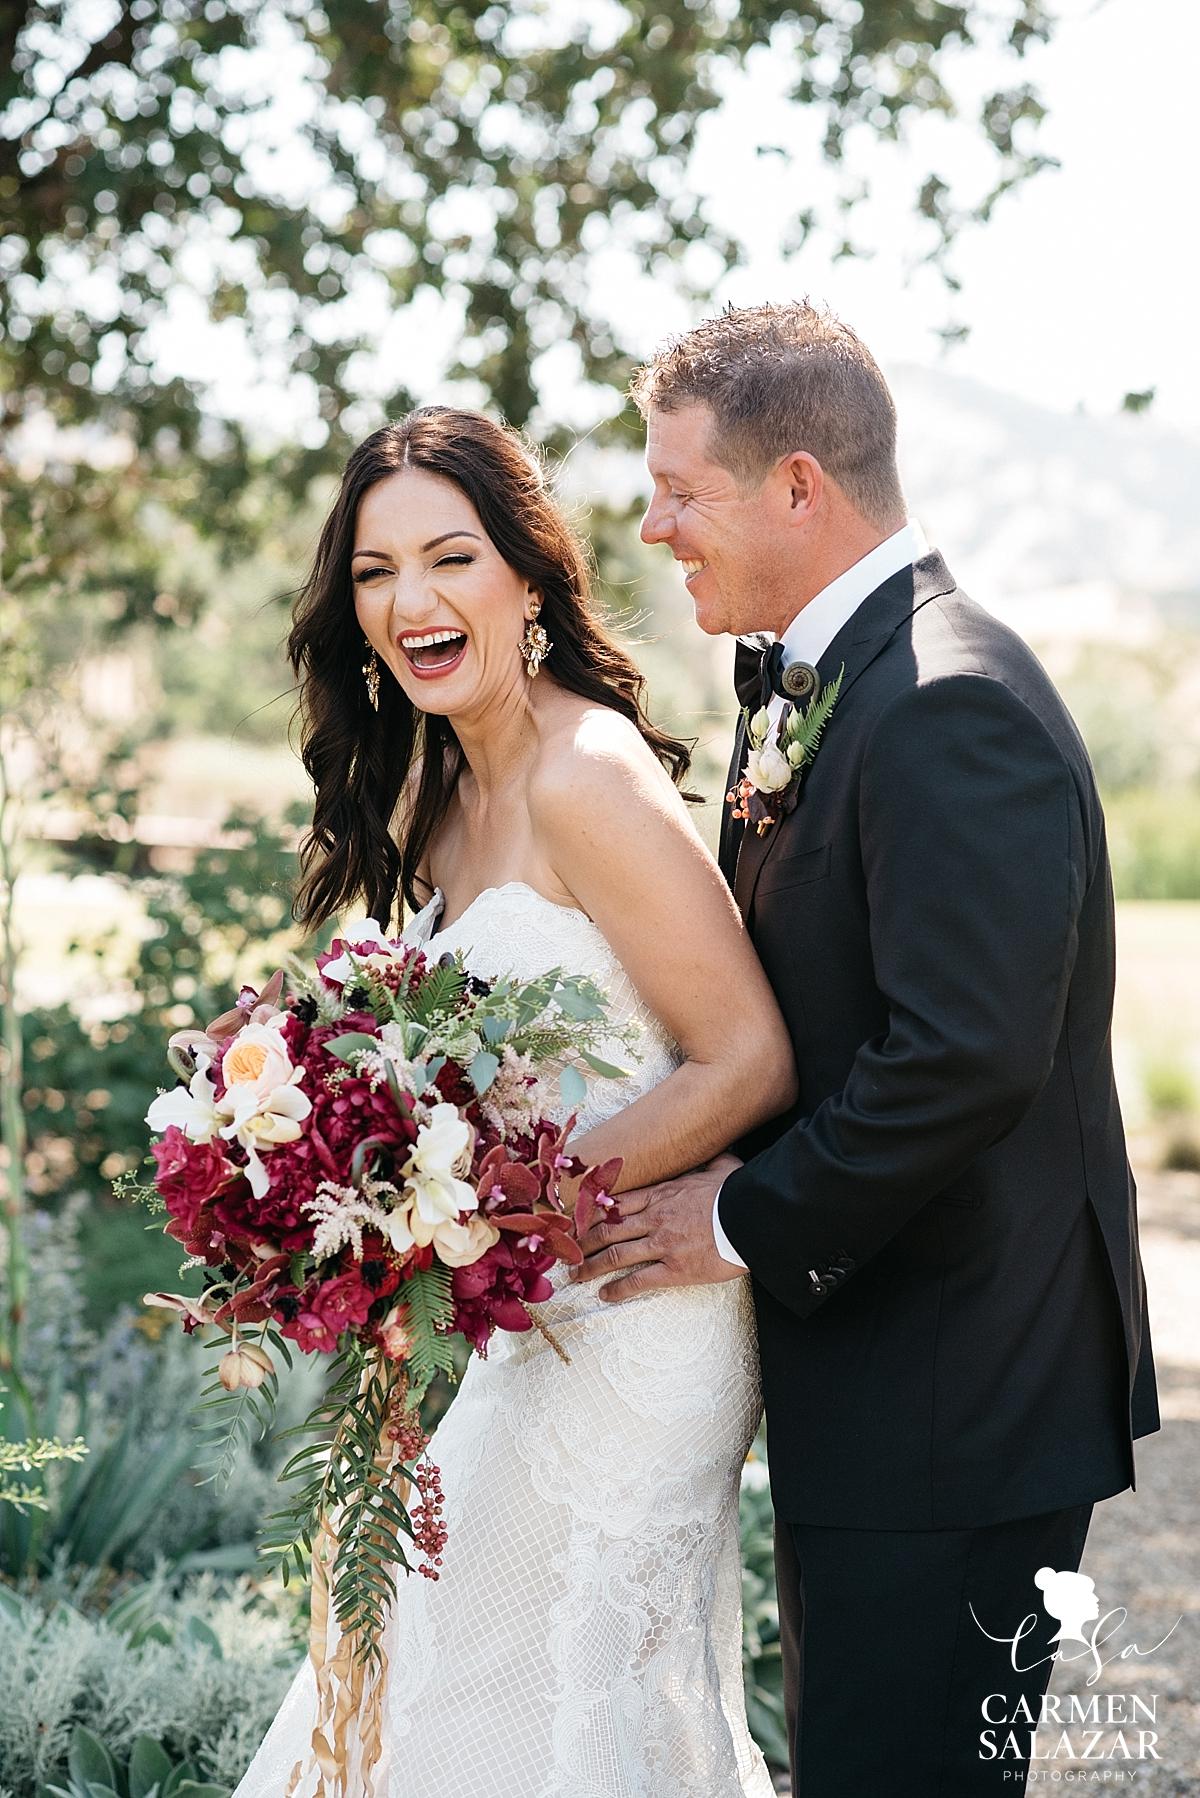 Sweet candid bride and groom portraits - Carmen Salazar